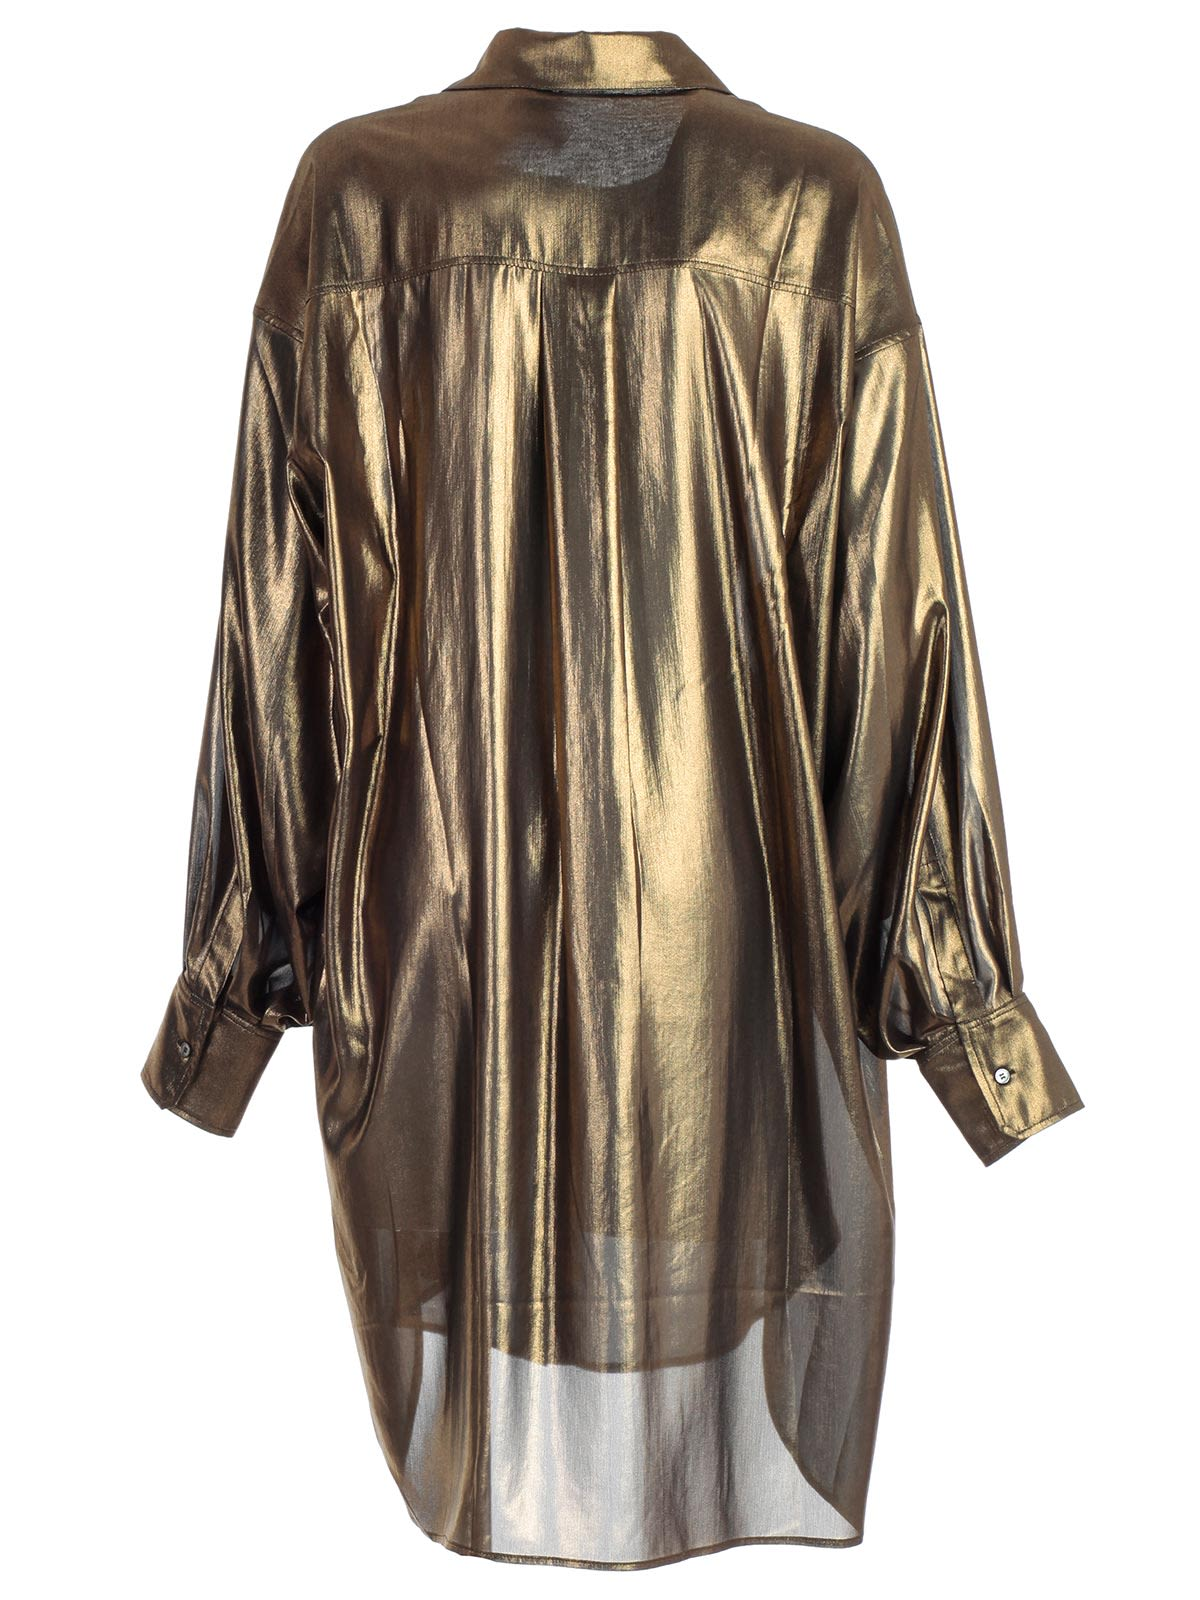 d792d7a4fb Faith Connexion Oversized Shirt - Gold Faith Connexion Oversized Shirt -  Gold ...